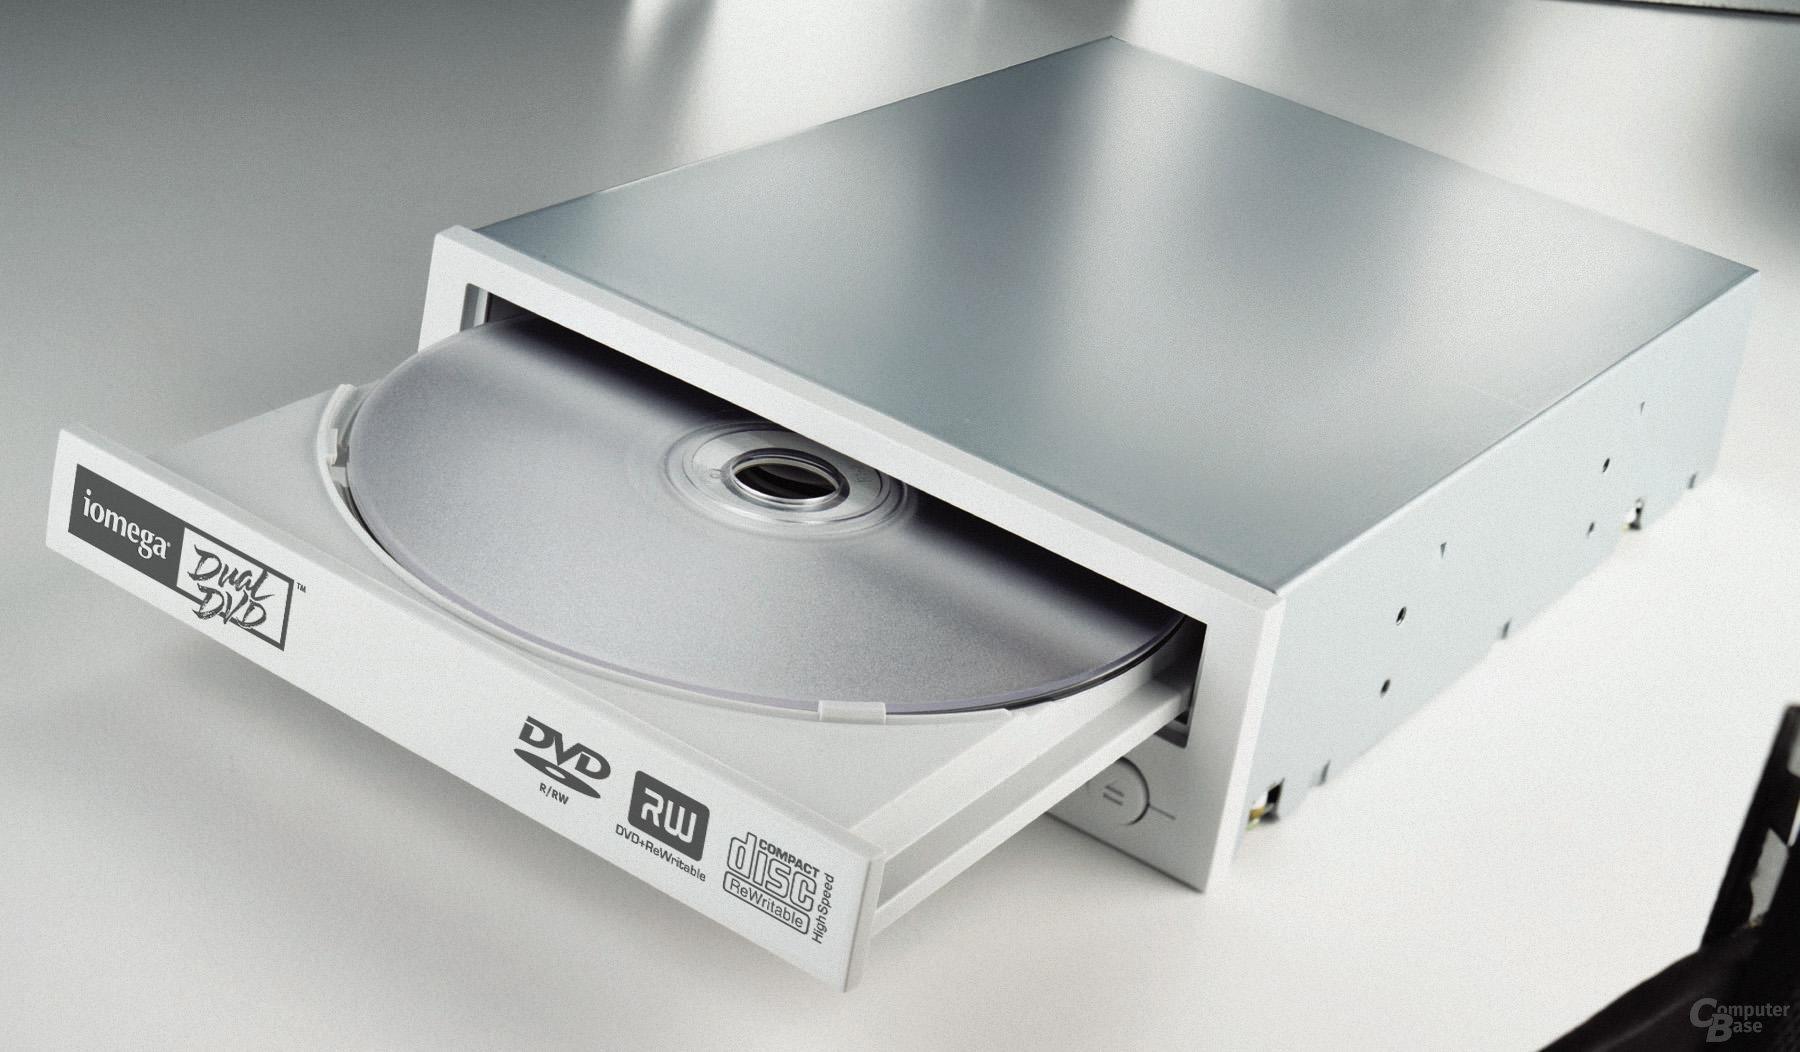 Iomega Dual DVD